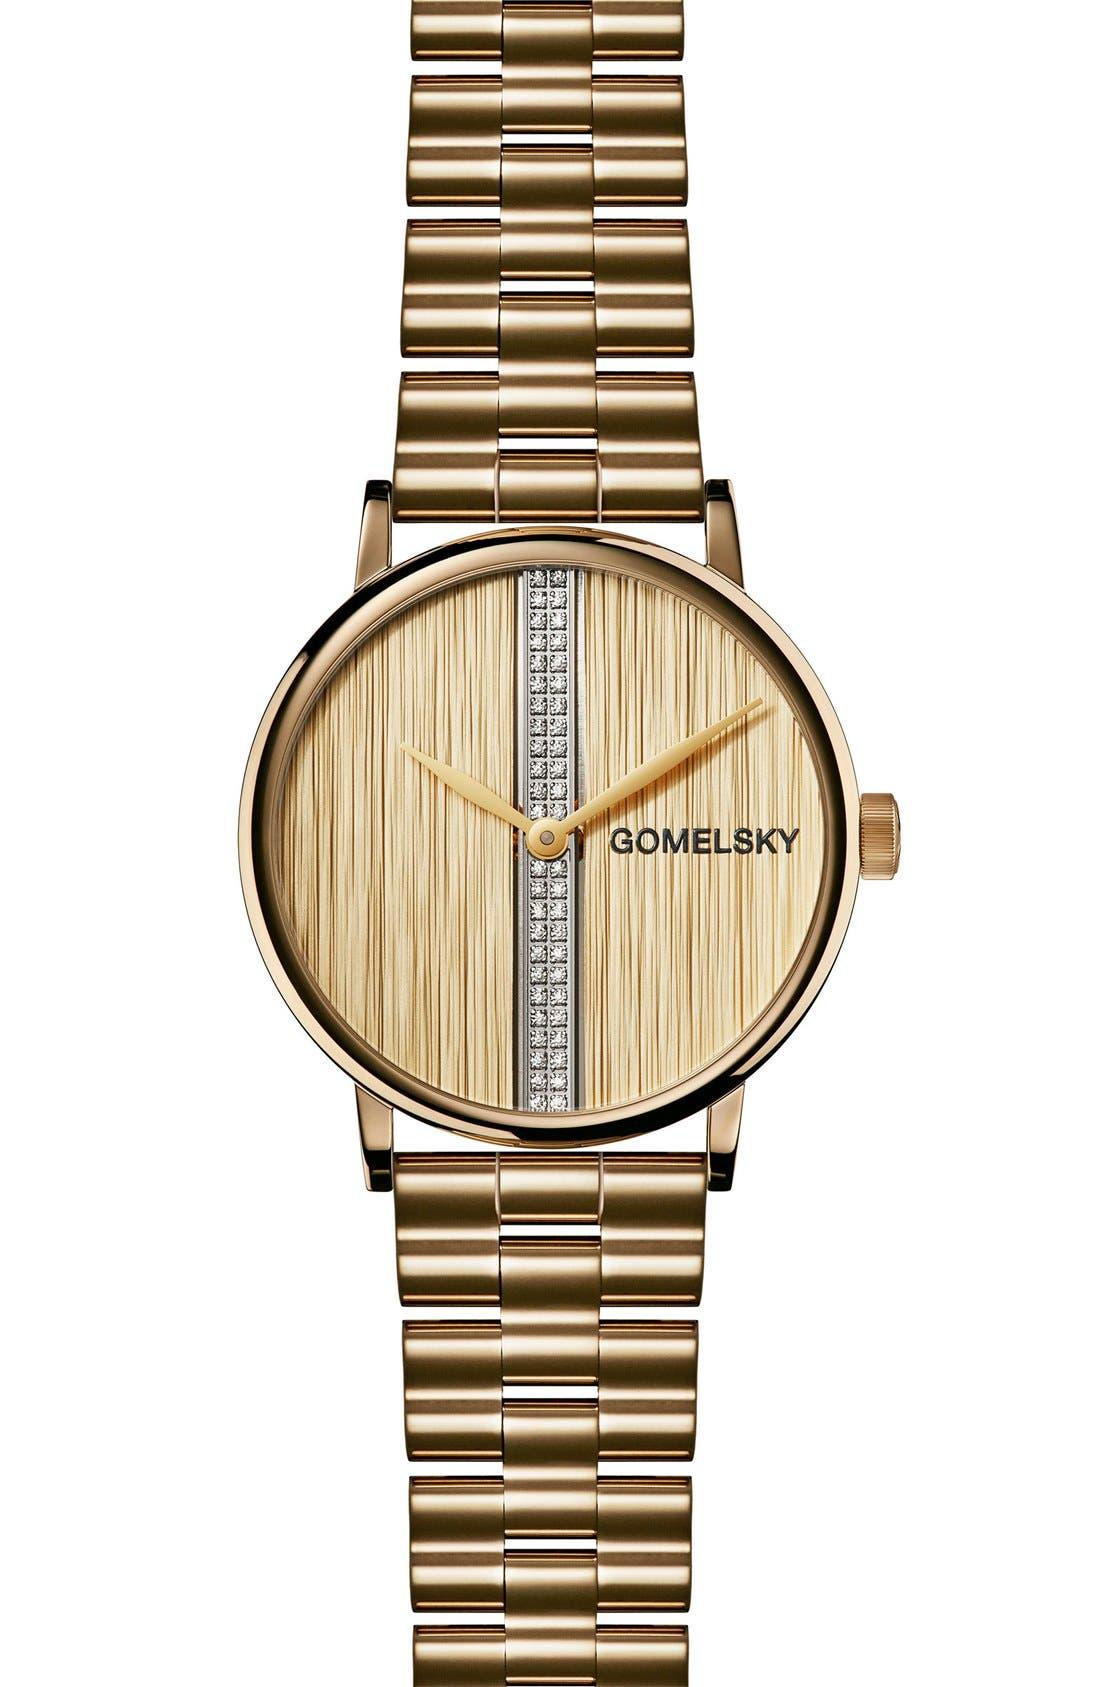 Gomelsky The Agnes Varis Diamond Bracelet Watch, 32mm